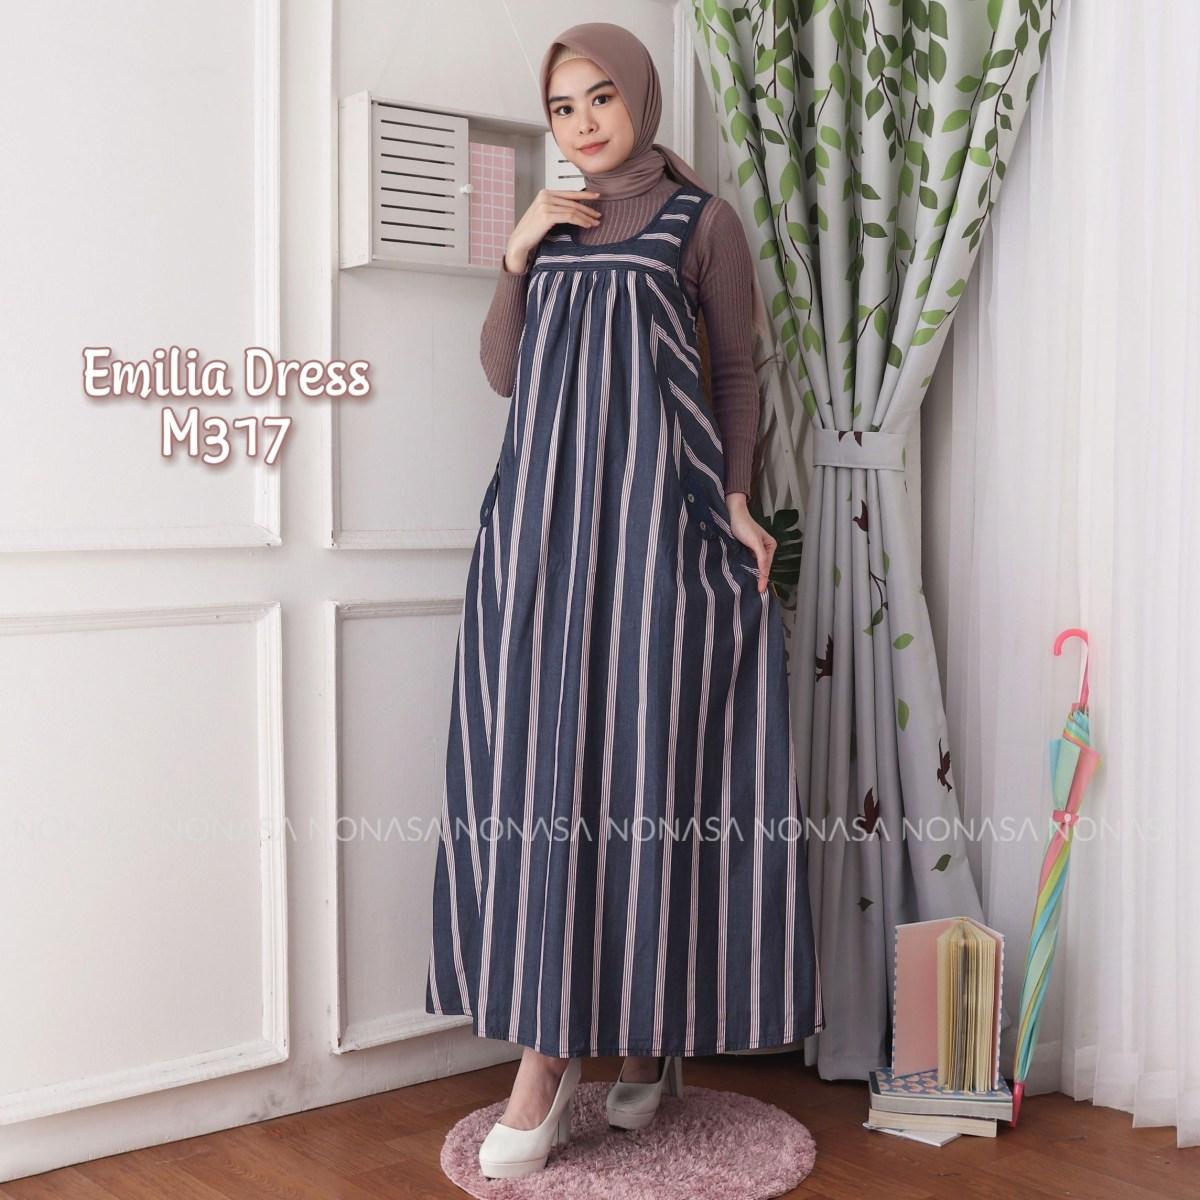 emilia dress m317 baju hijab style ootd